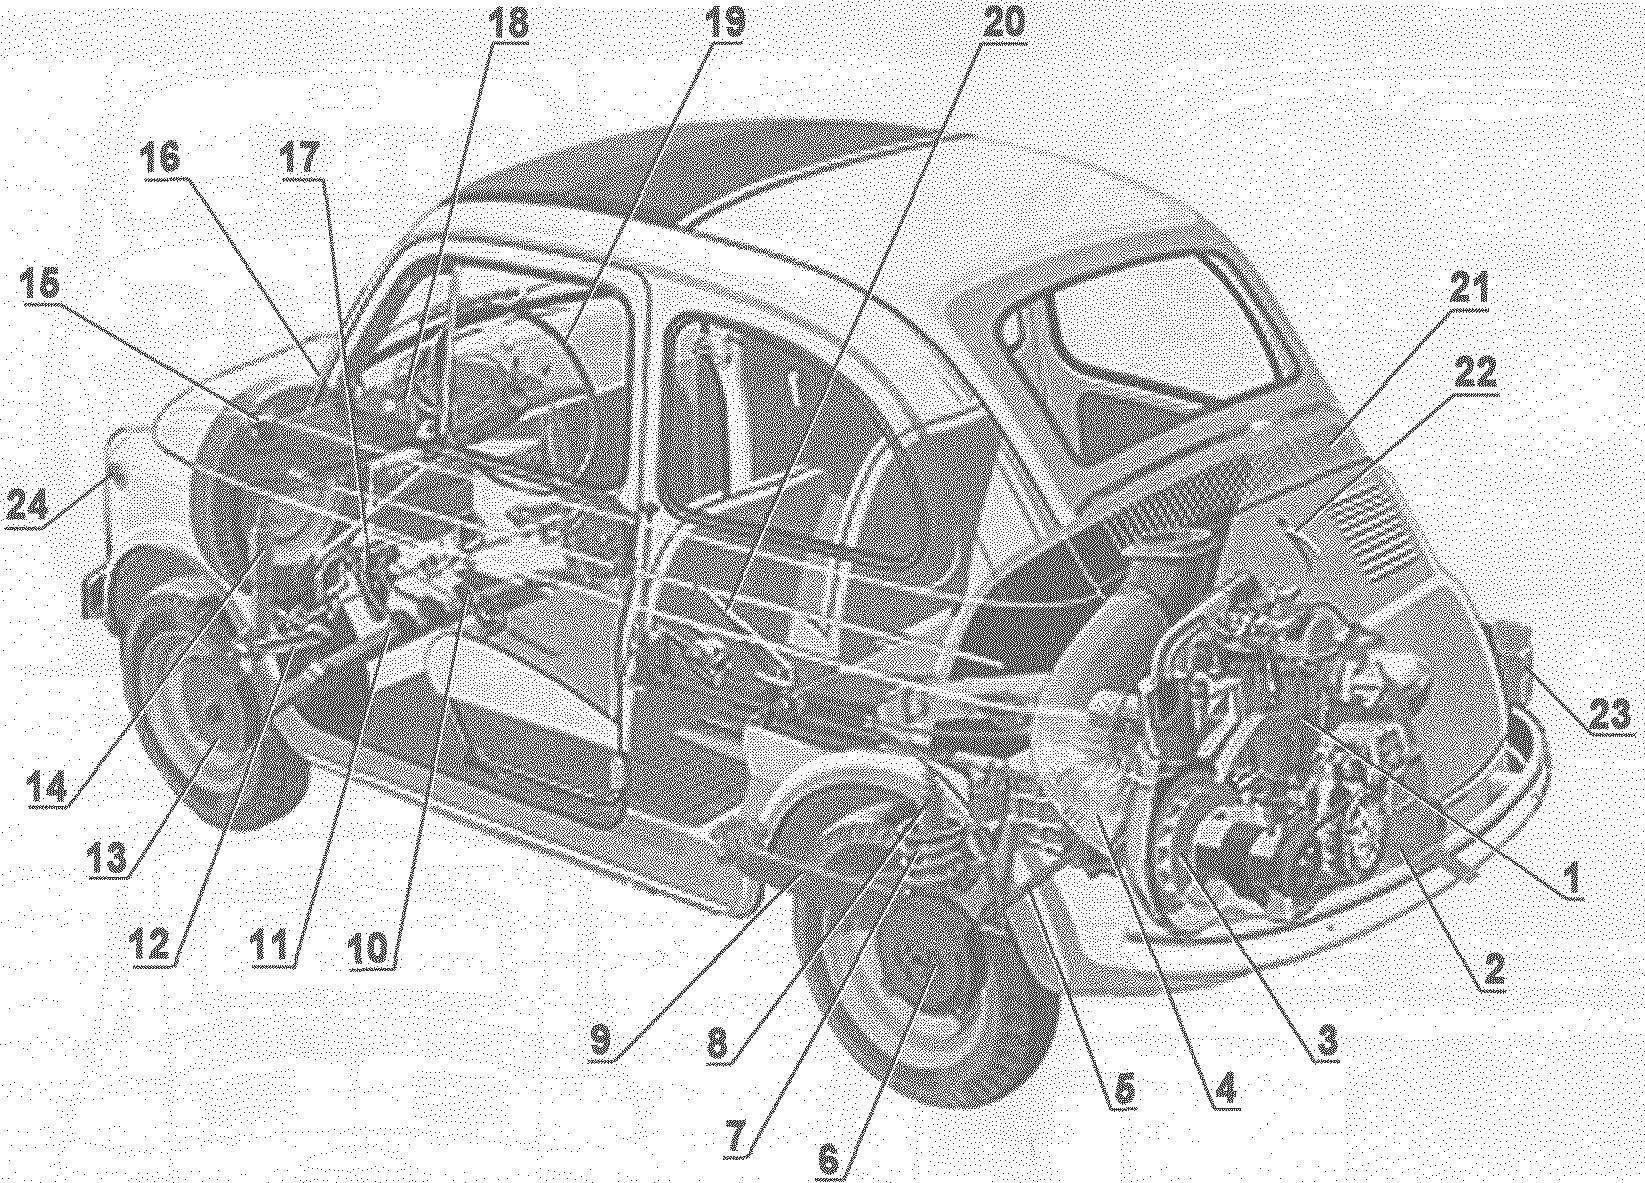 Компоновка автомобиля FIAT-500 Nuova (Bambino)